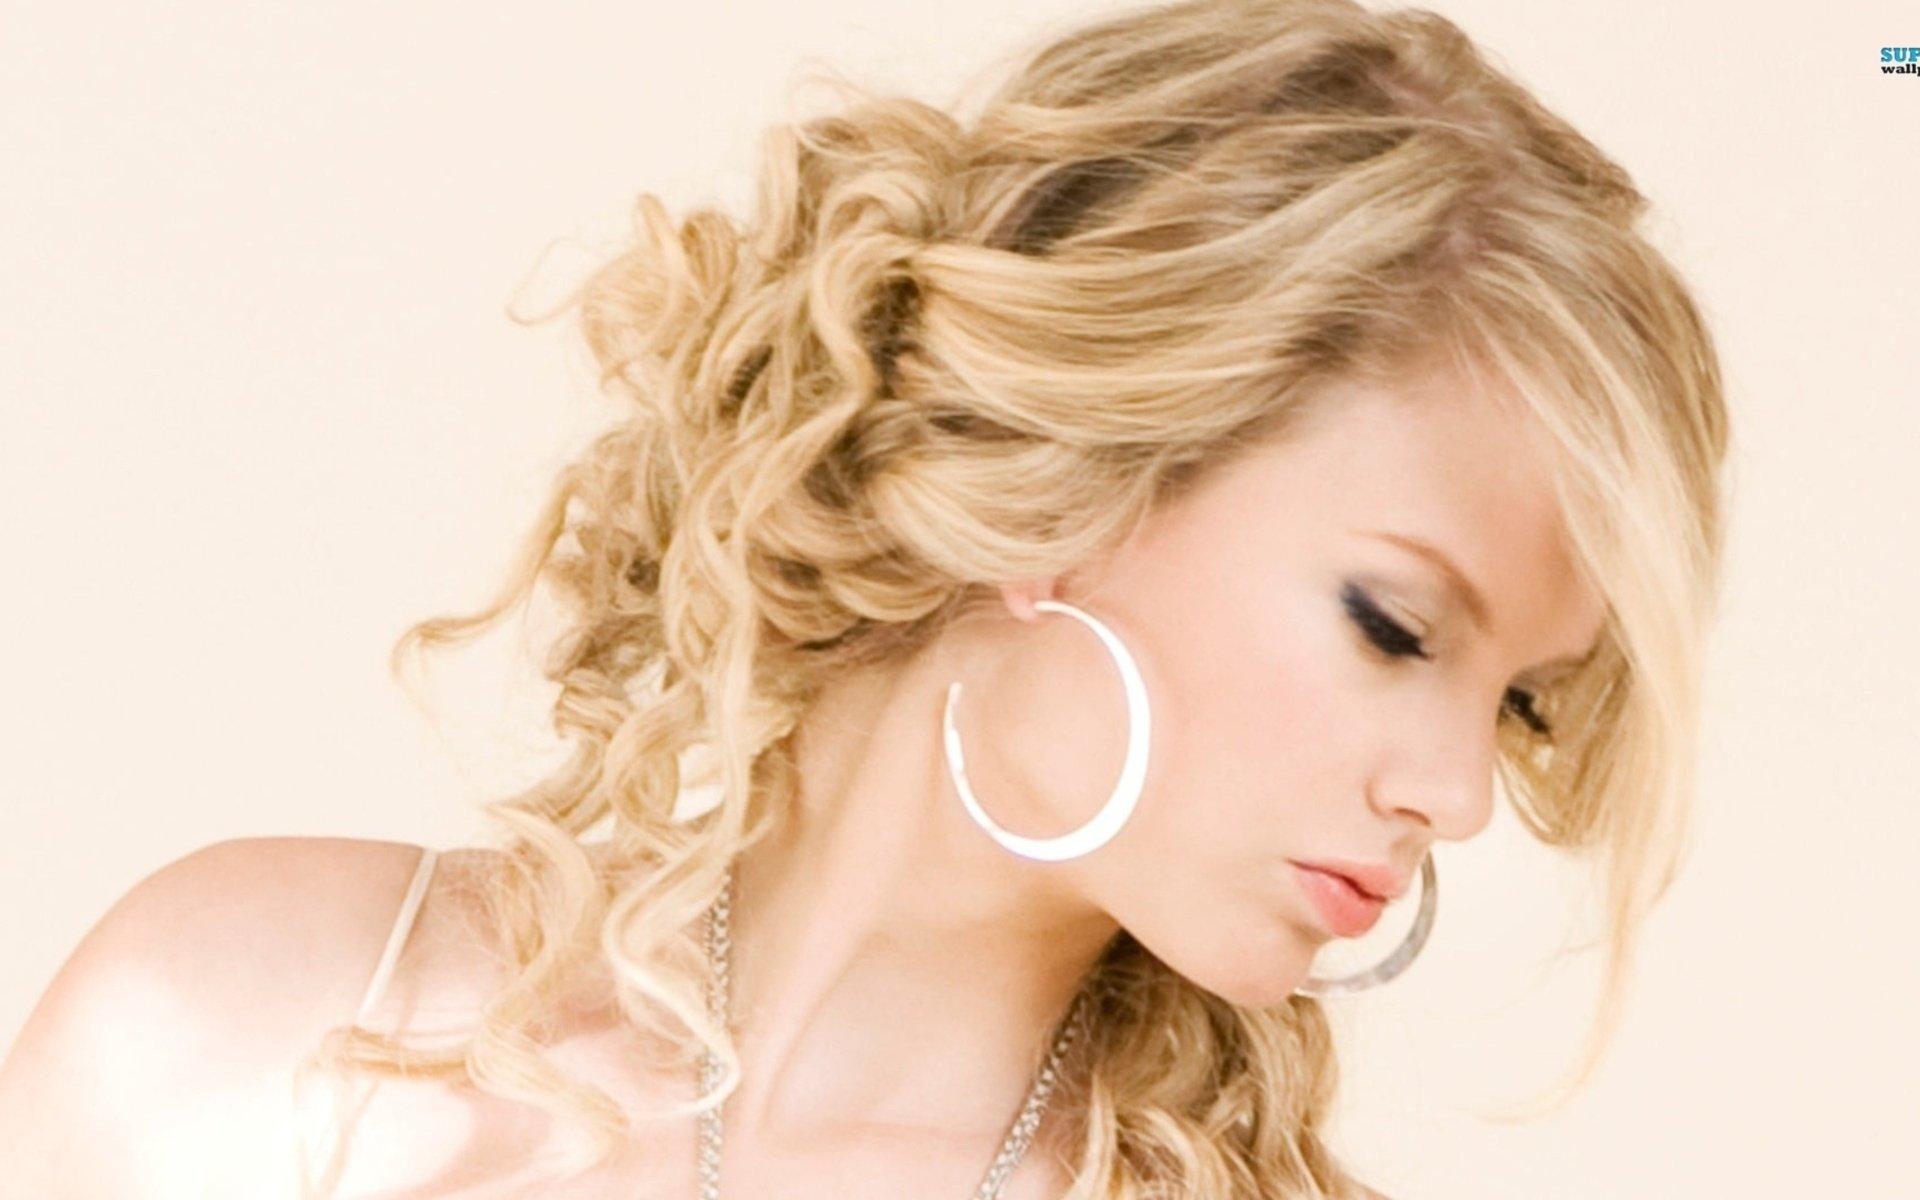 Music - Taylor Swift  Wallpaper